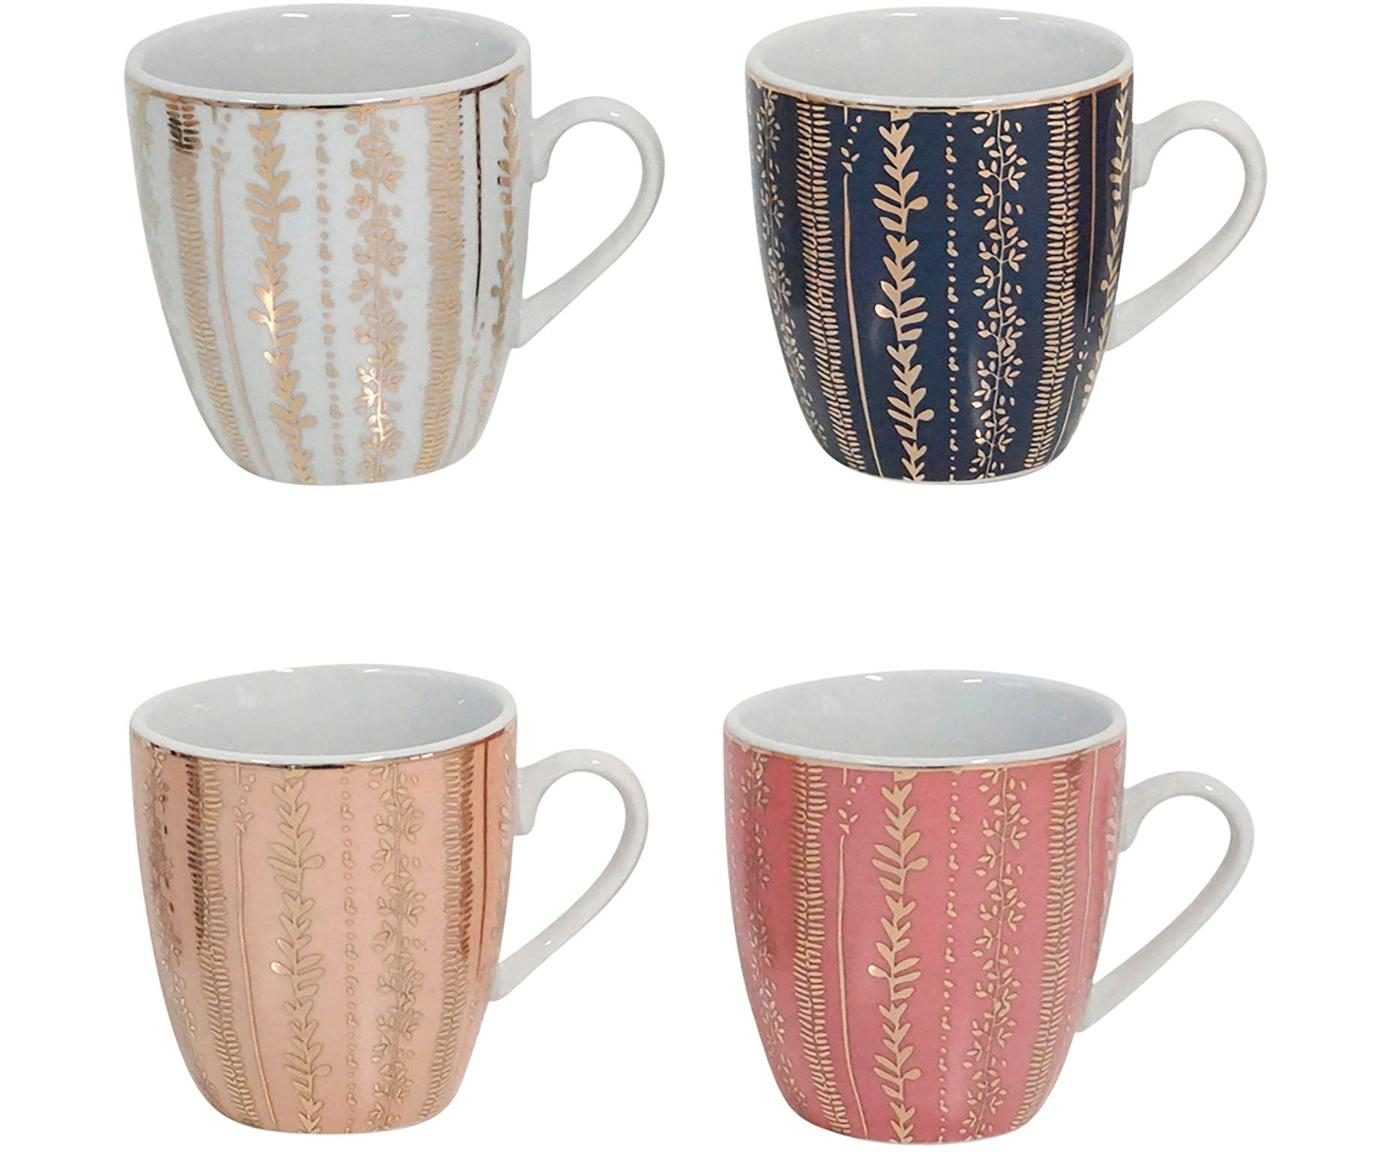 Set de tazas de café Veg-Gold, 4 uds., Porcelana, Rosa, azul, Ø 7 x Al 8 cm